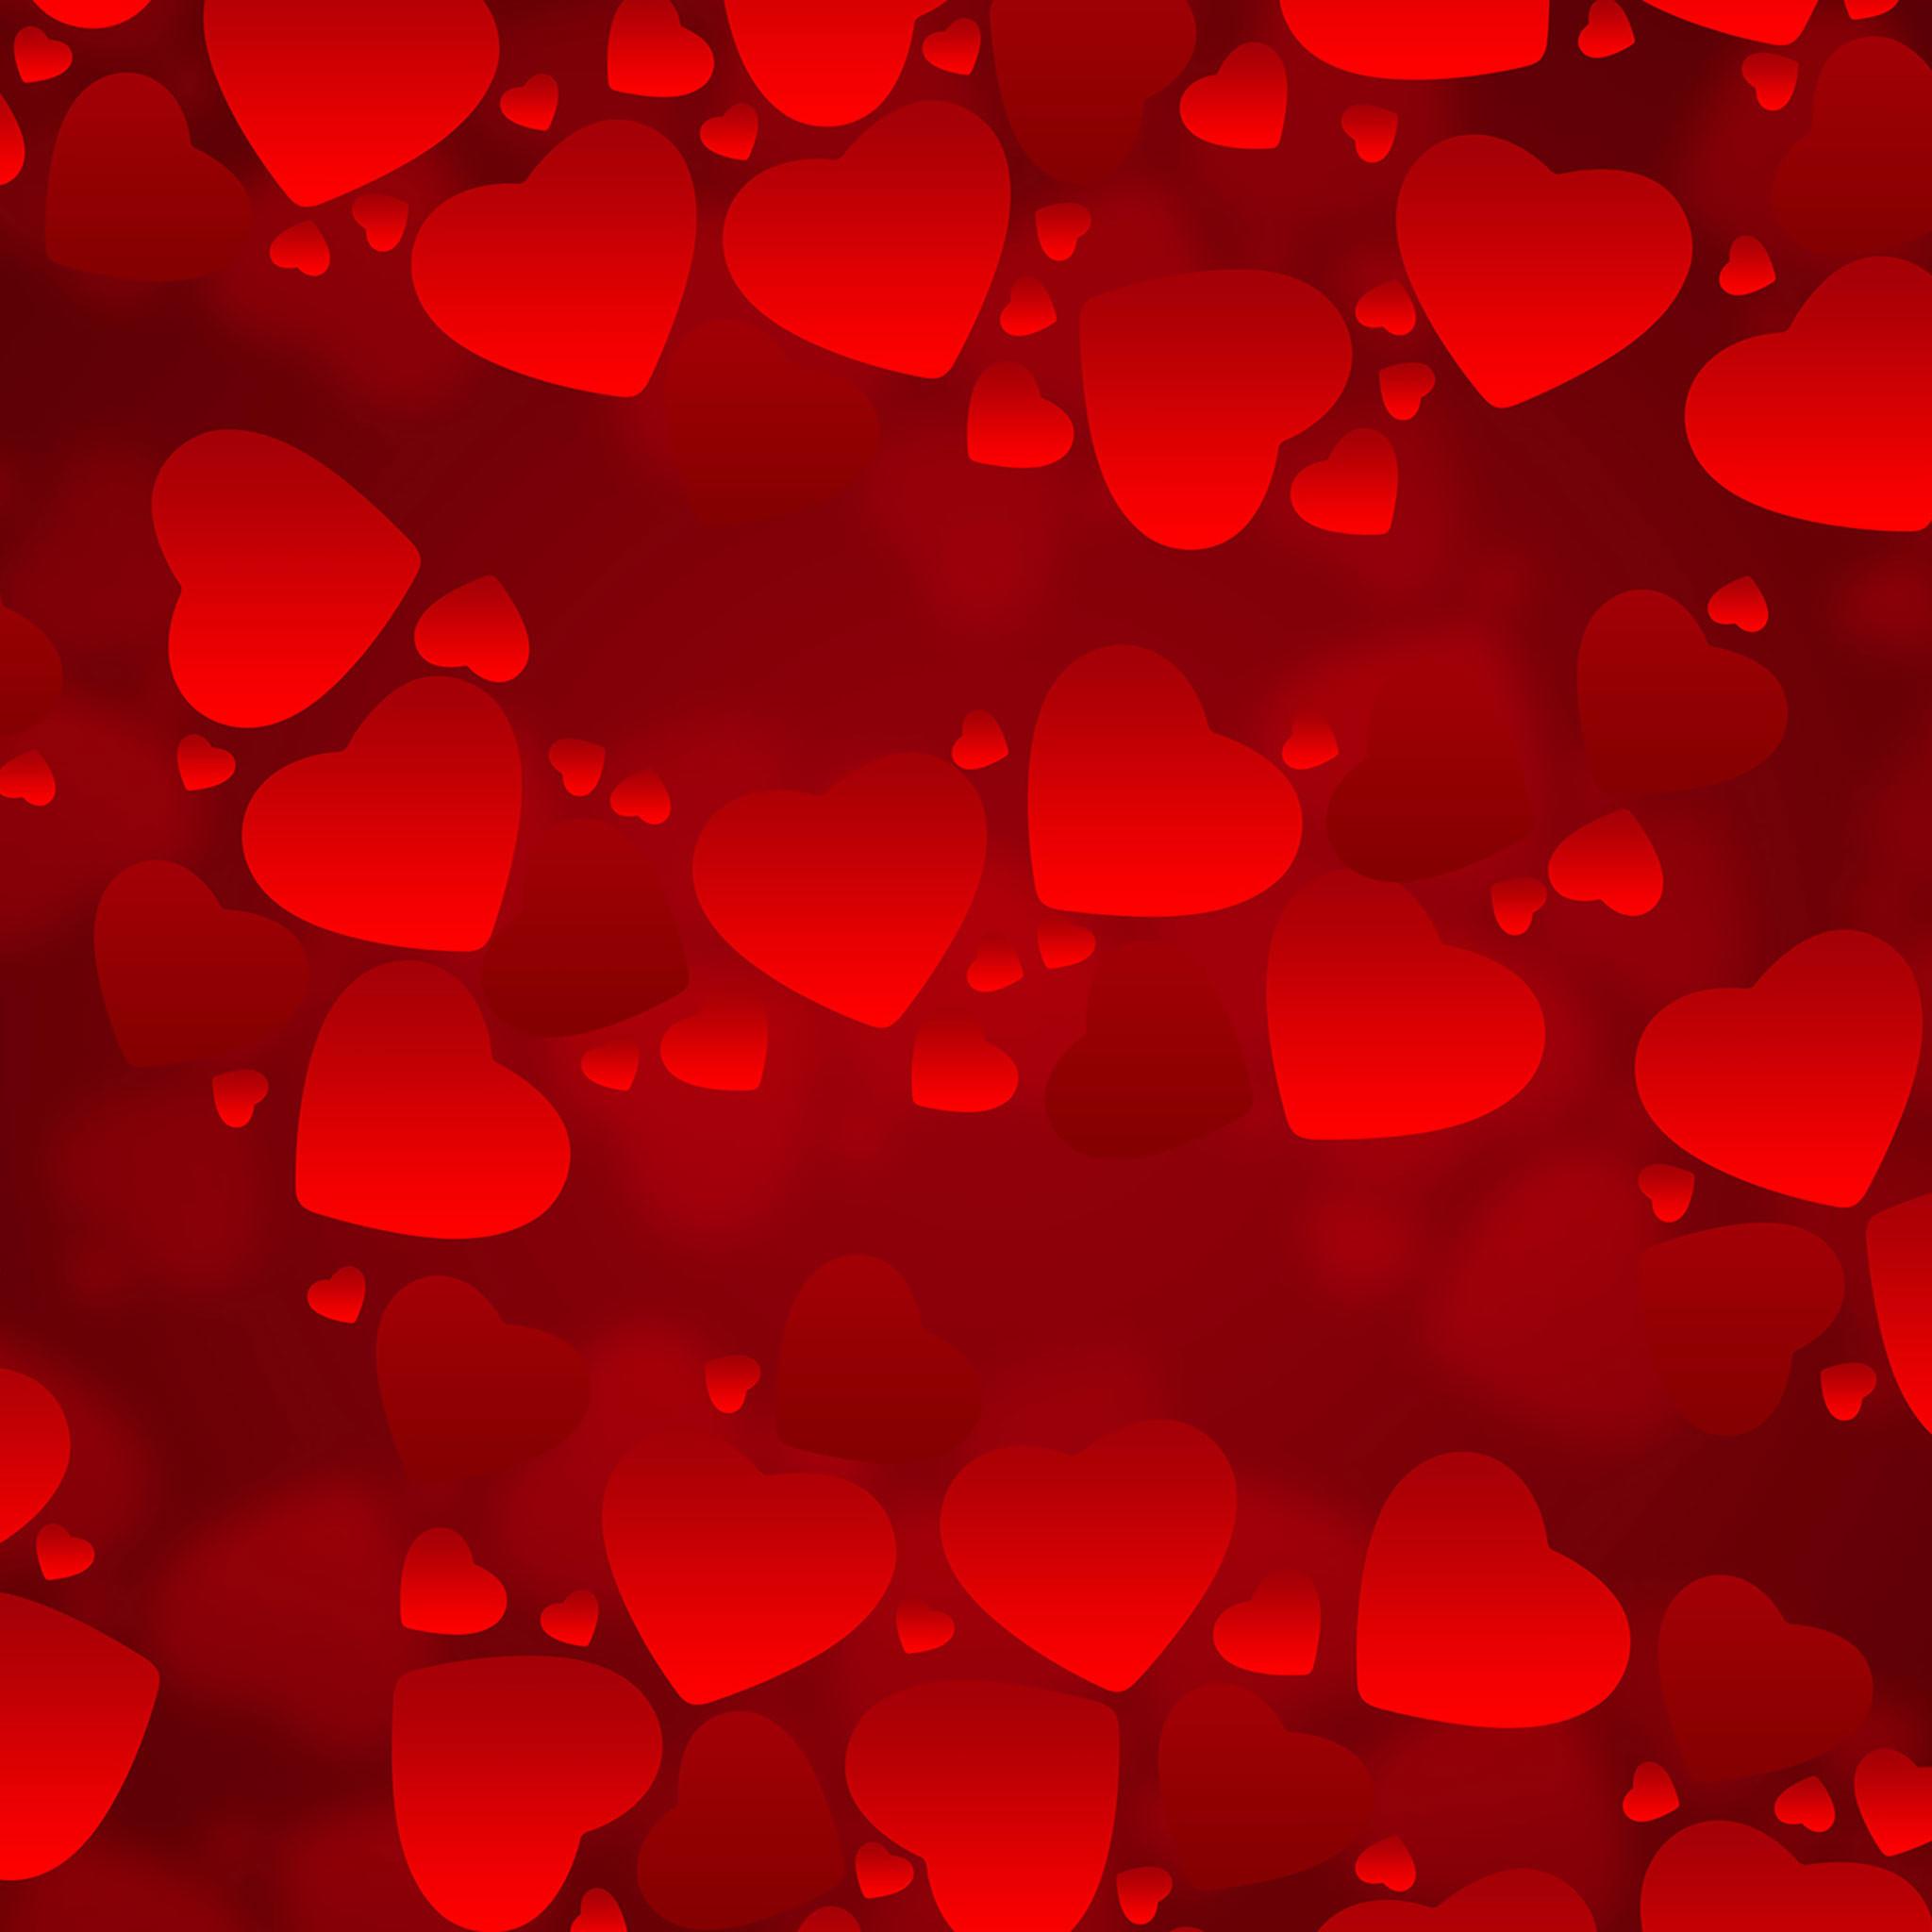 Valentine's Day iPad Wallpaper 15